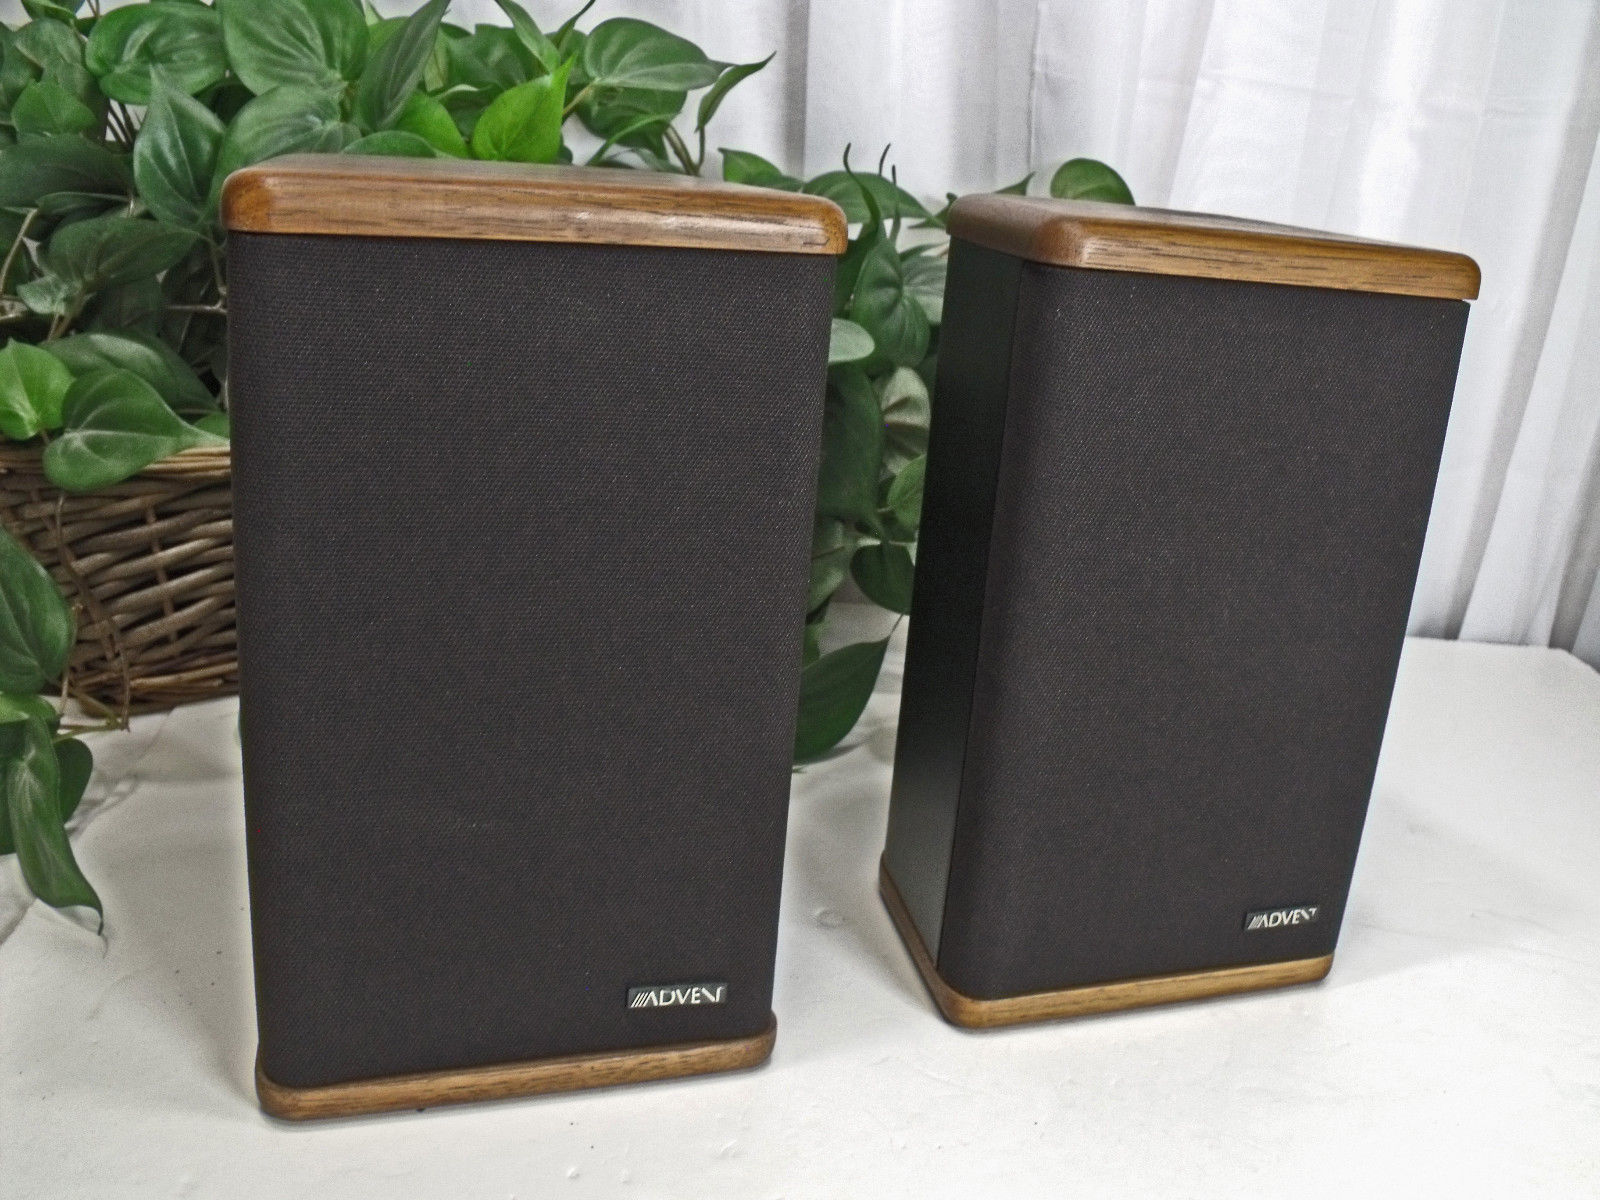 used advent speakers for sale. Black Bedroom Furniture Sets. Home Design Ideas